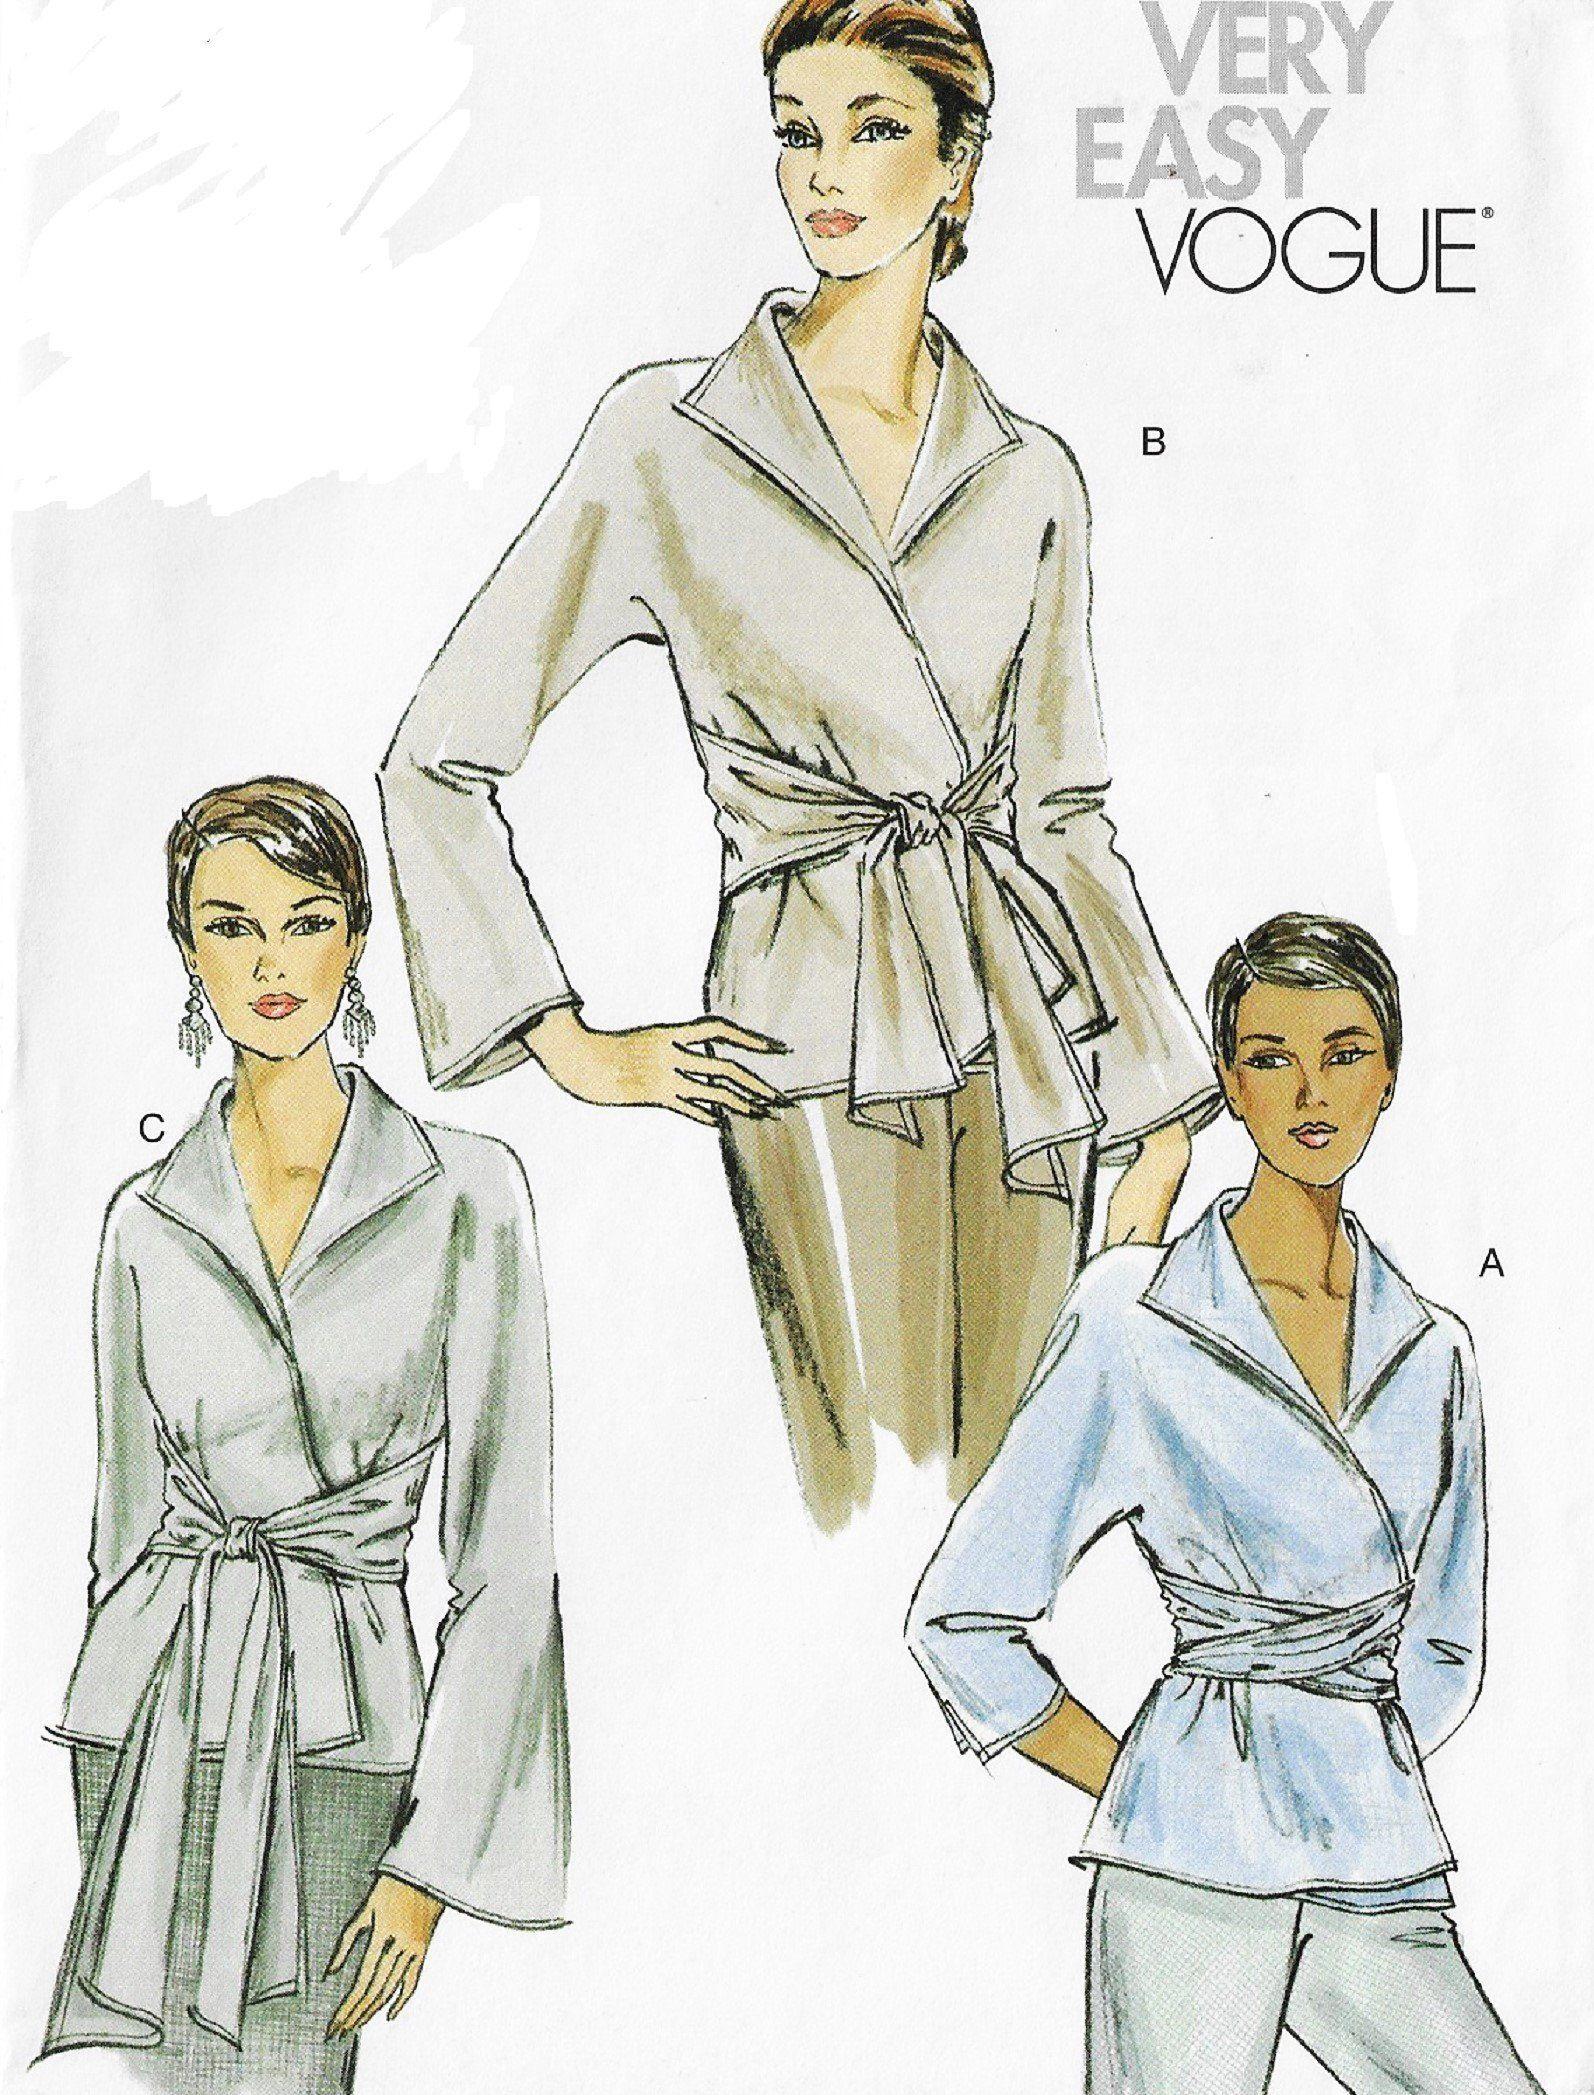 Vtg 60s Retro Blouse Skirt Jacket Knit Cardigan Sewing Pattern Size 6 8 10 12 14